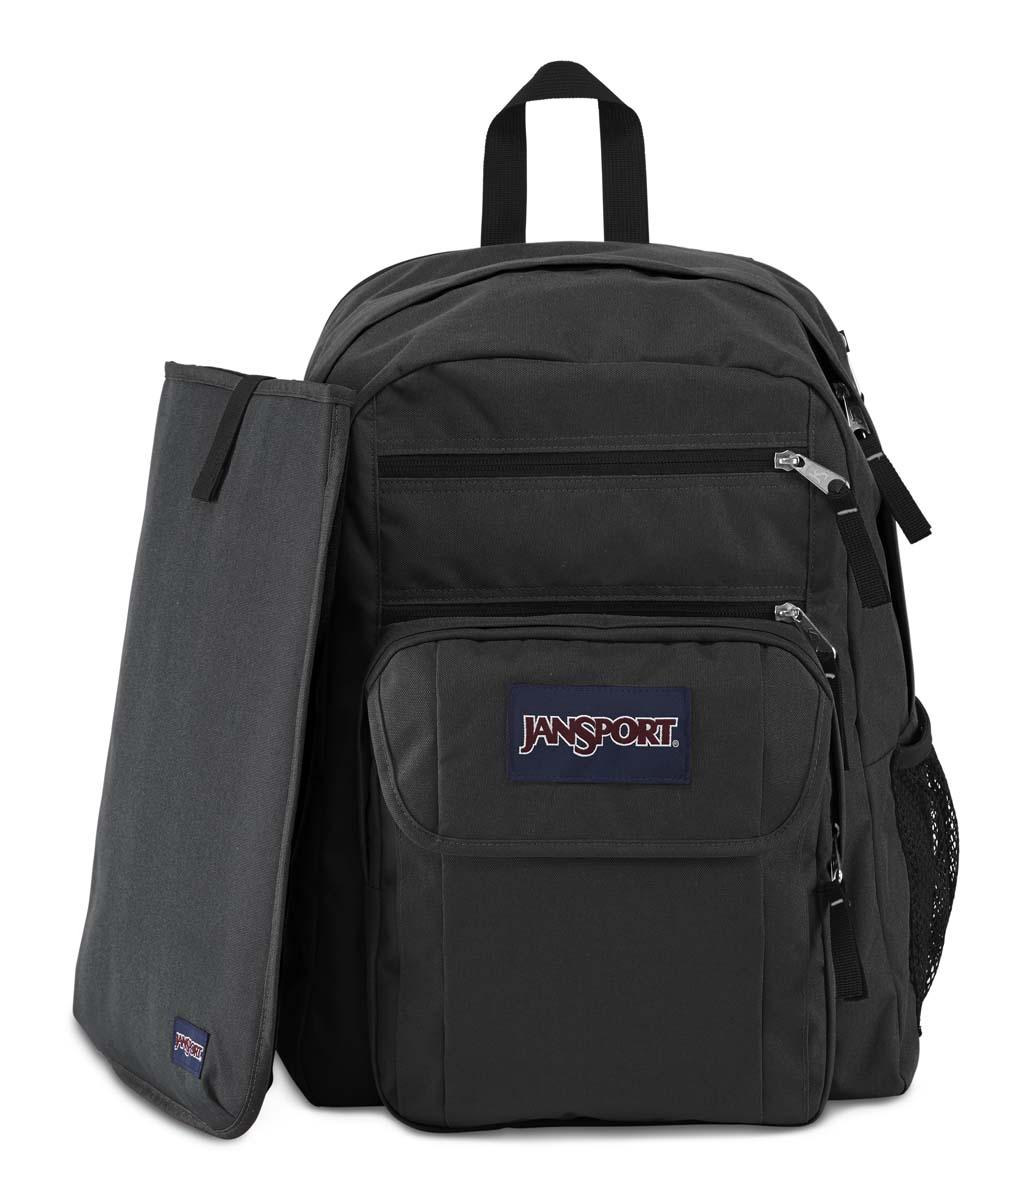 JanSport กระเป๋าเป้ รุ่น Digital Student - Black